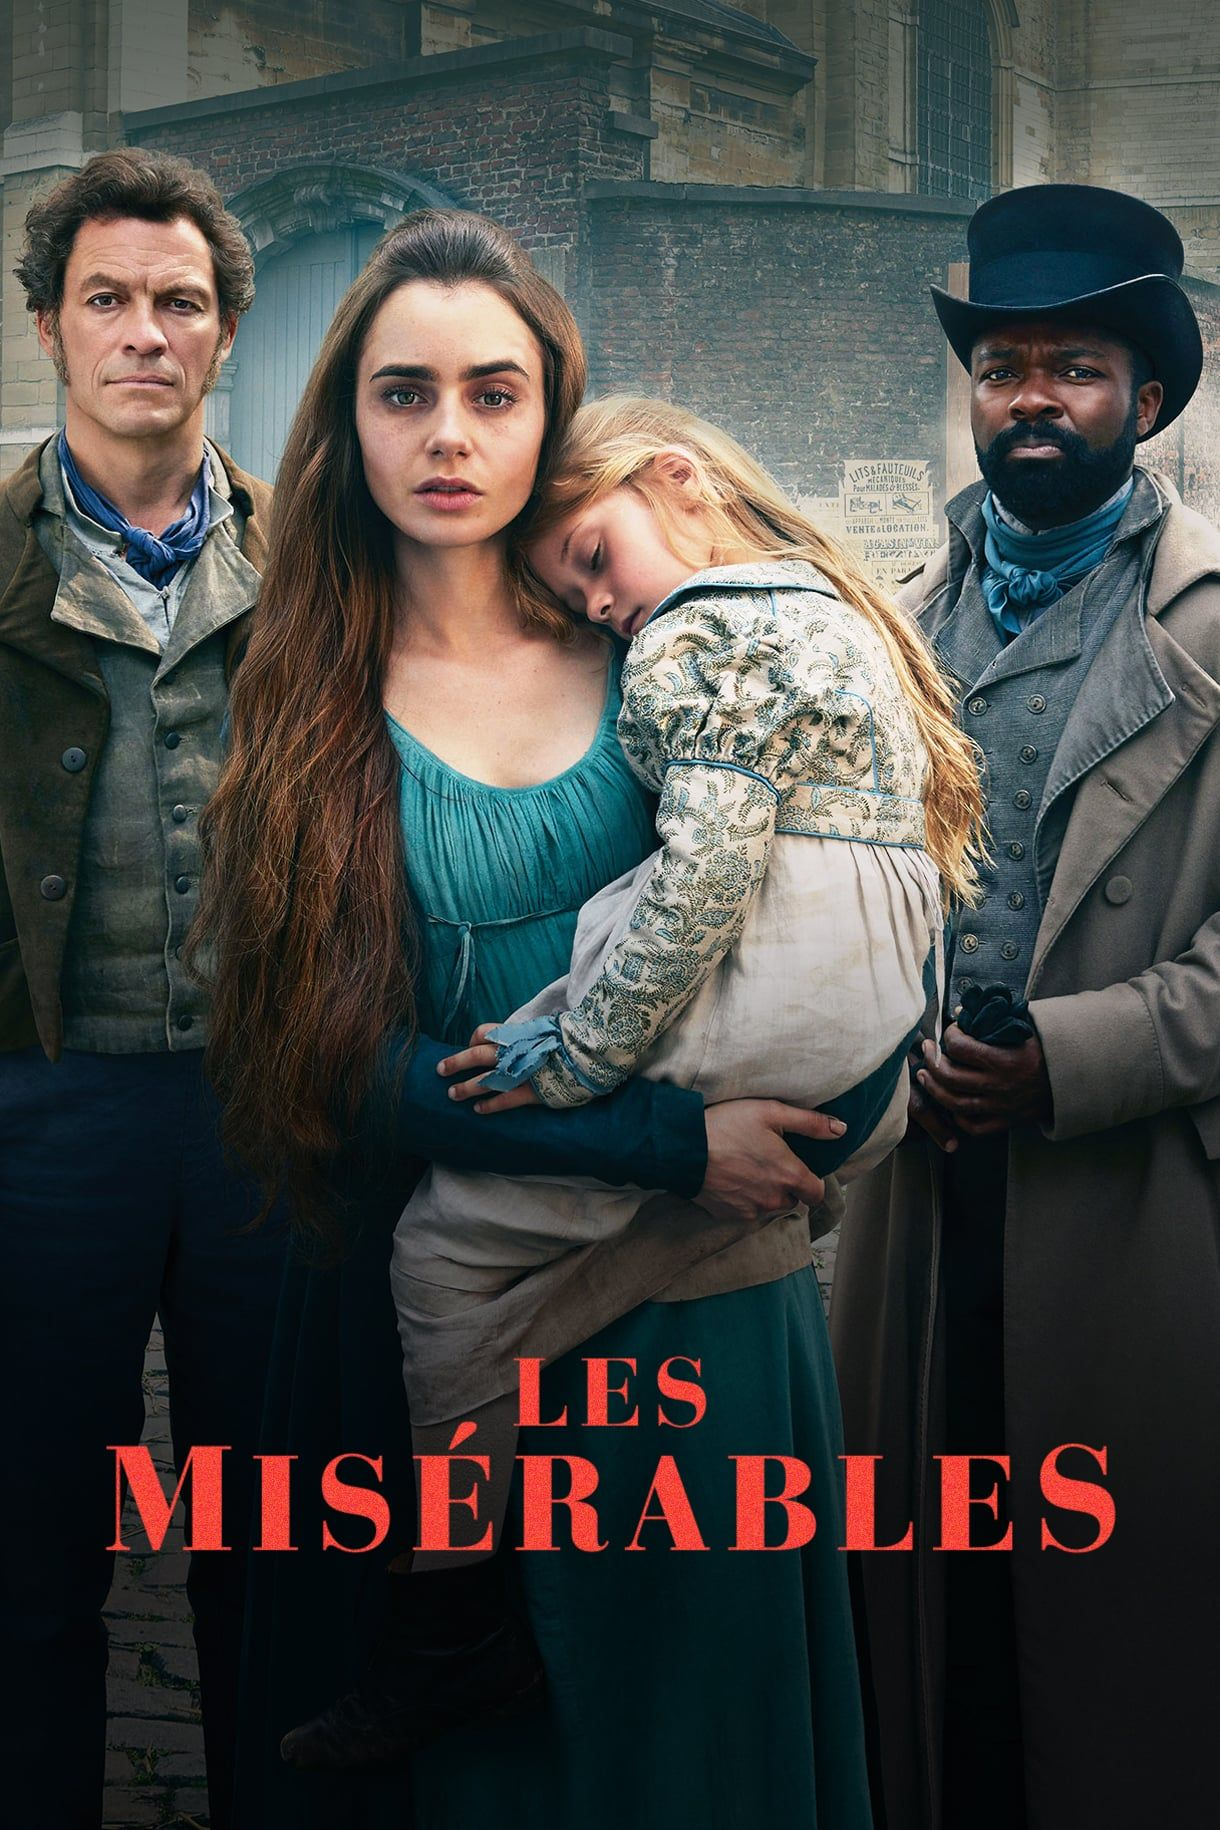 Assistir Les Miserables Online Hd 720p Dublado E Legendado